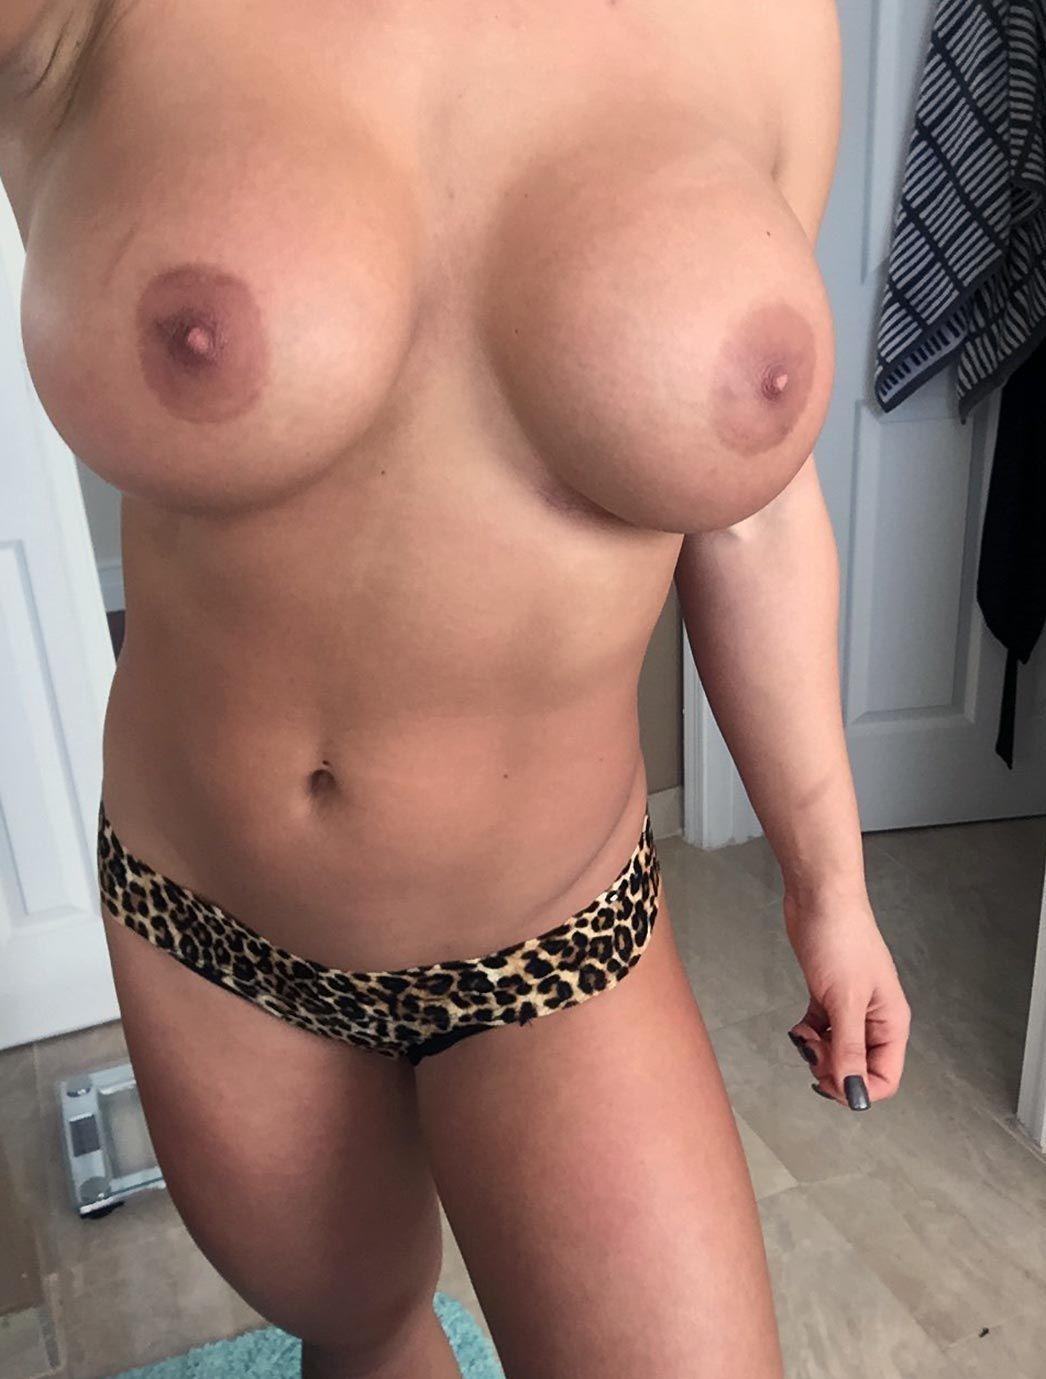 Celeste Bonin Nude Leaked The Fappening & Sexy 0151